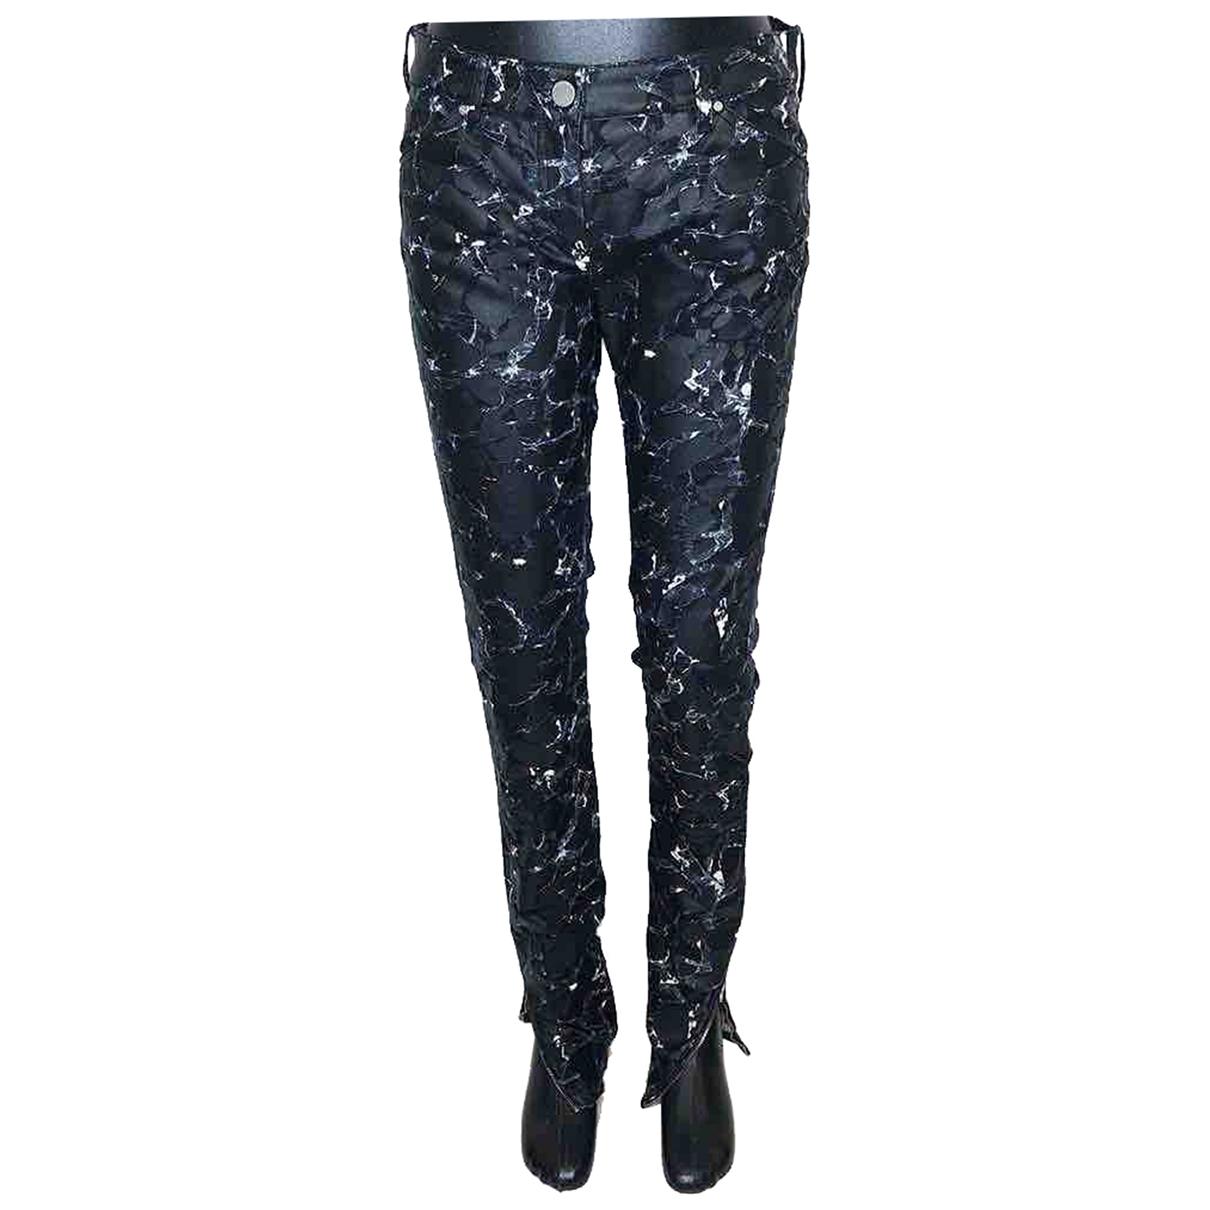 Balenciaga \N Black Cotton - elasthane Jeans for Women 38 FR